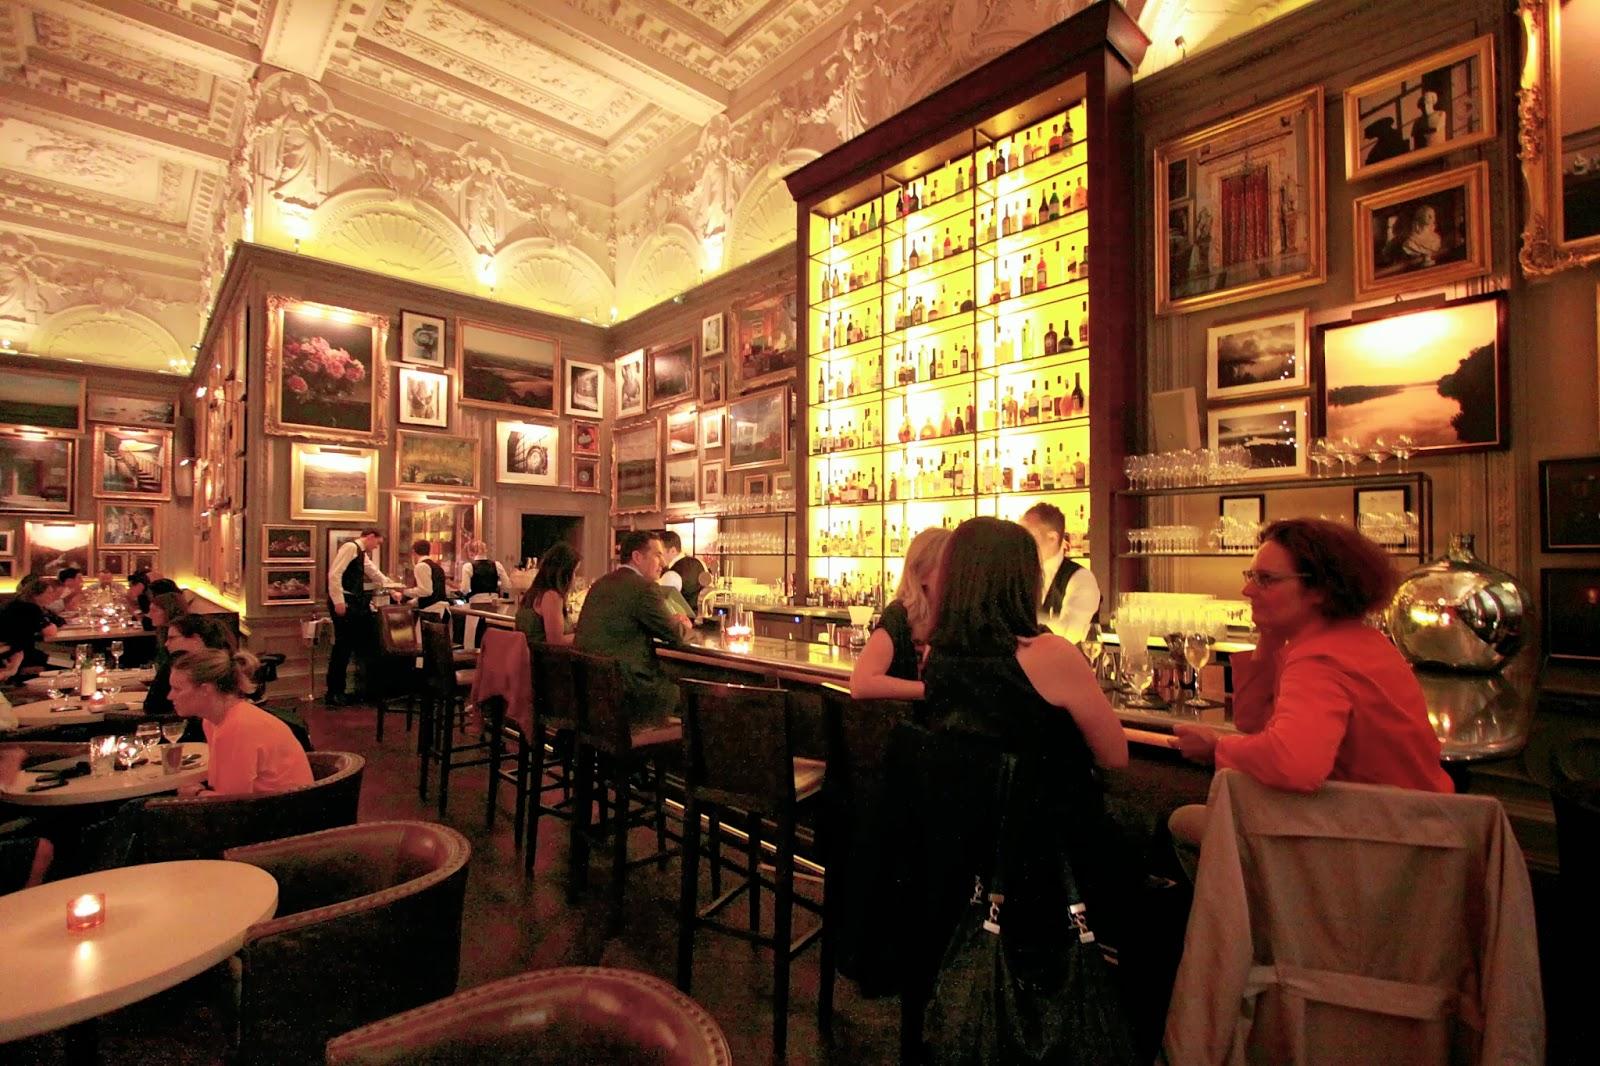 The London Foodie: London Restaurant Reviews - Berners Tavern